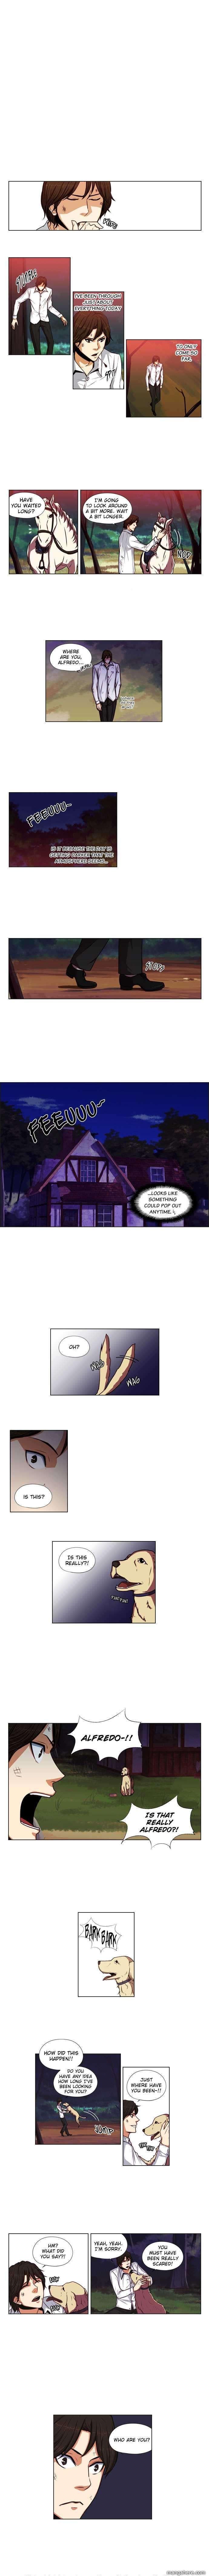 Serendipity 3 Page 3